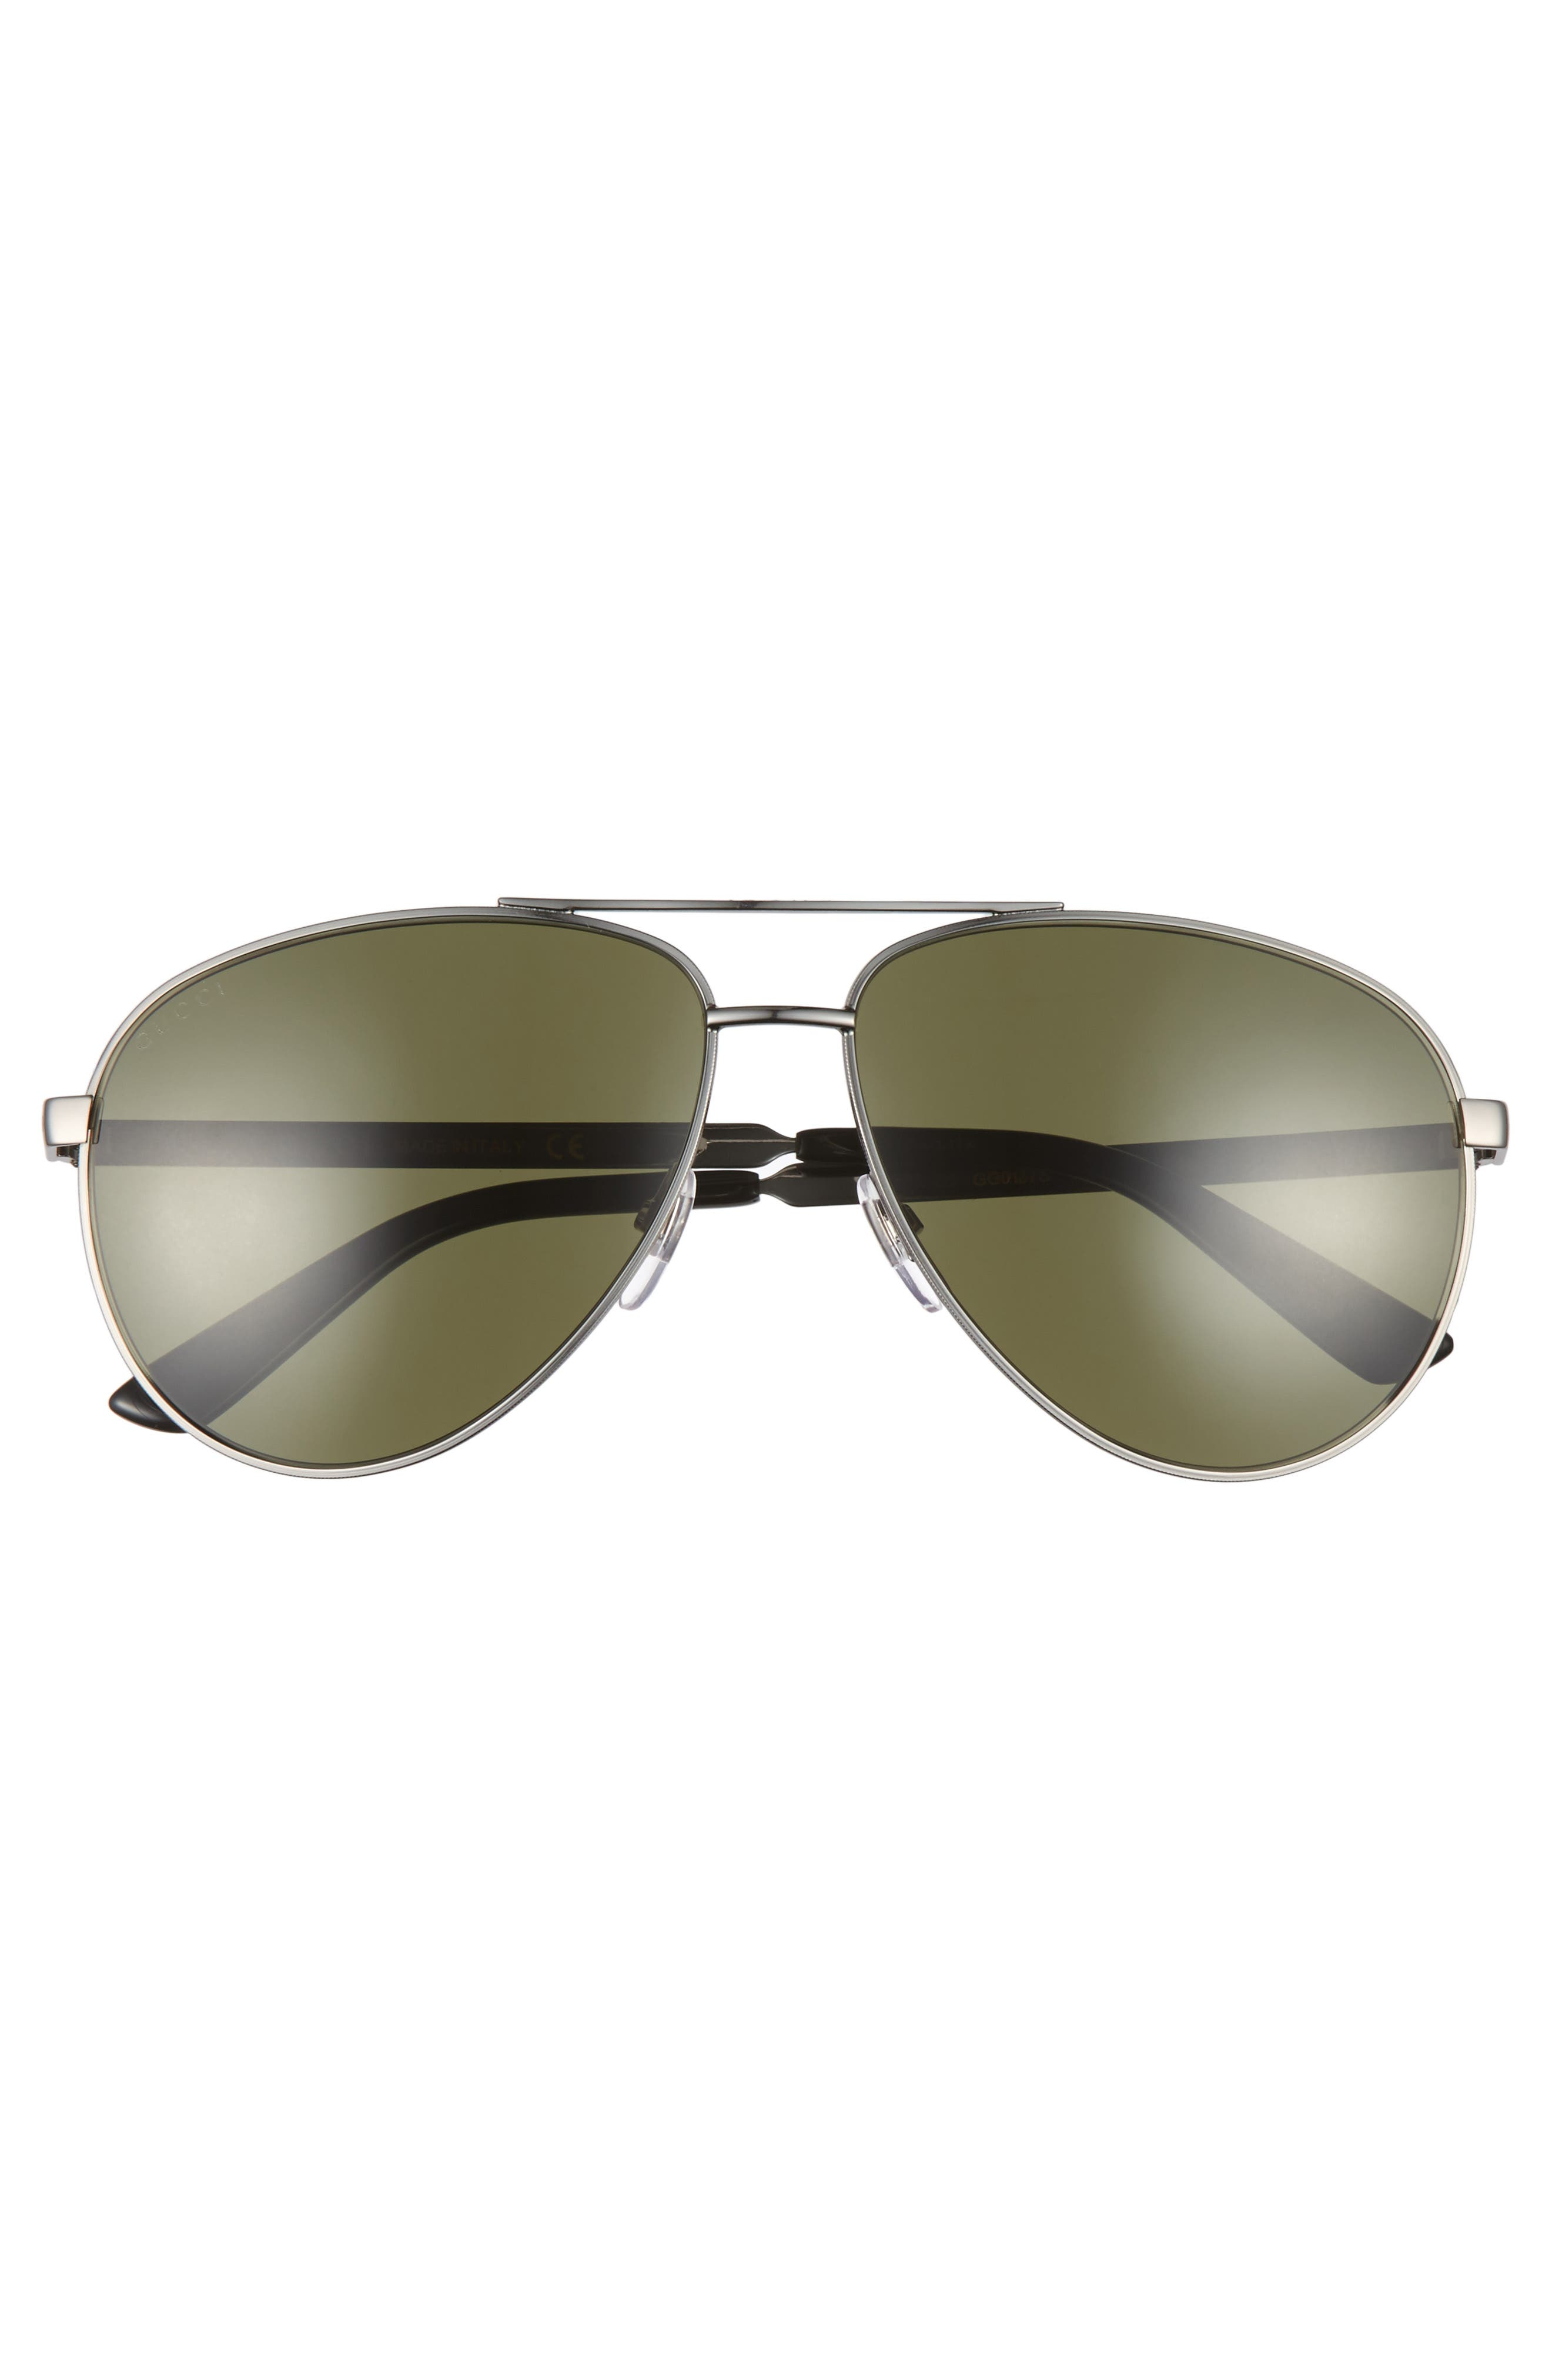 GUCCI, 61mm Aviator Sunglasses, Alternate thumbnail 2, color, 042